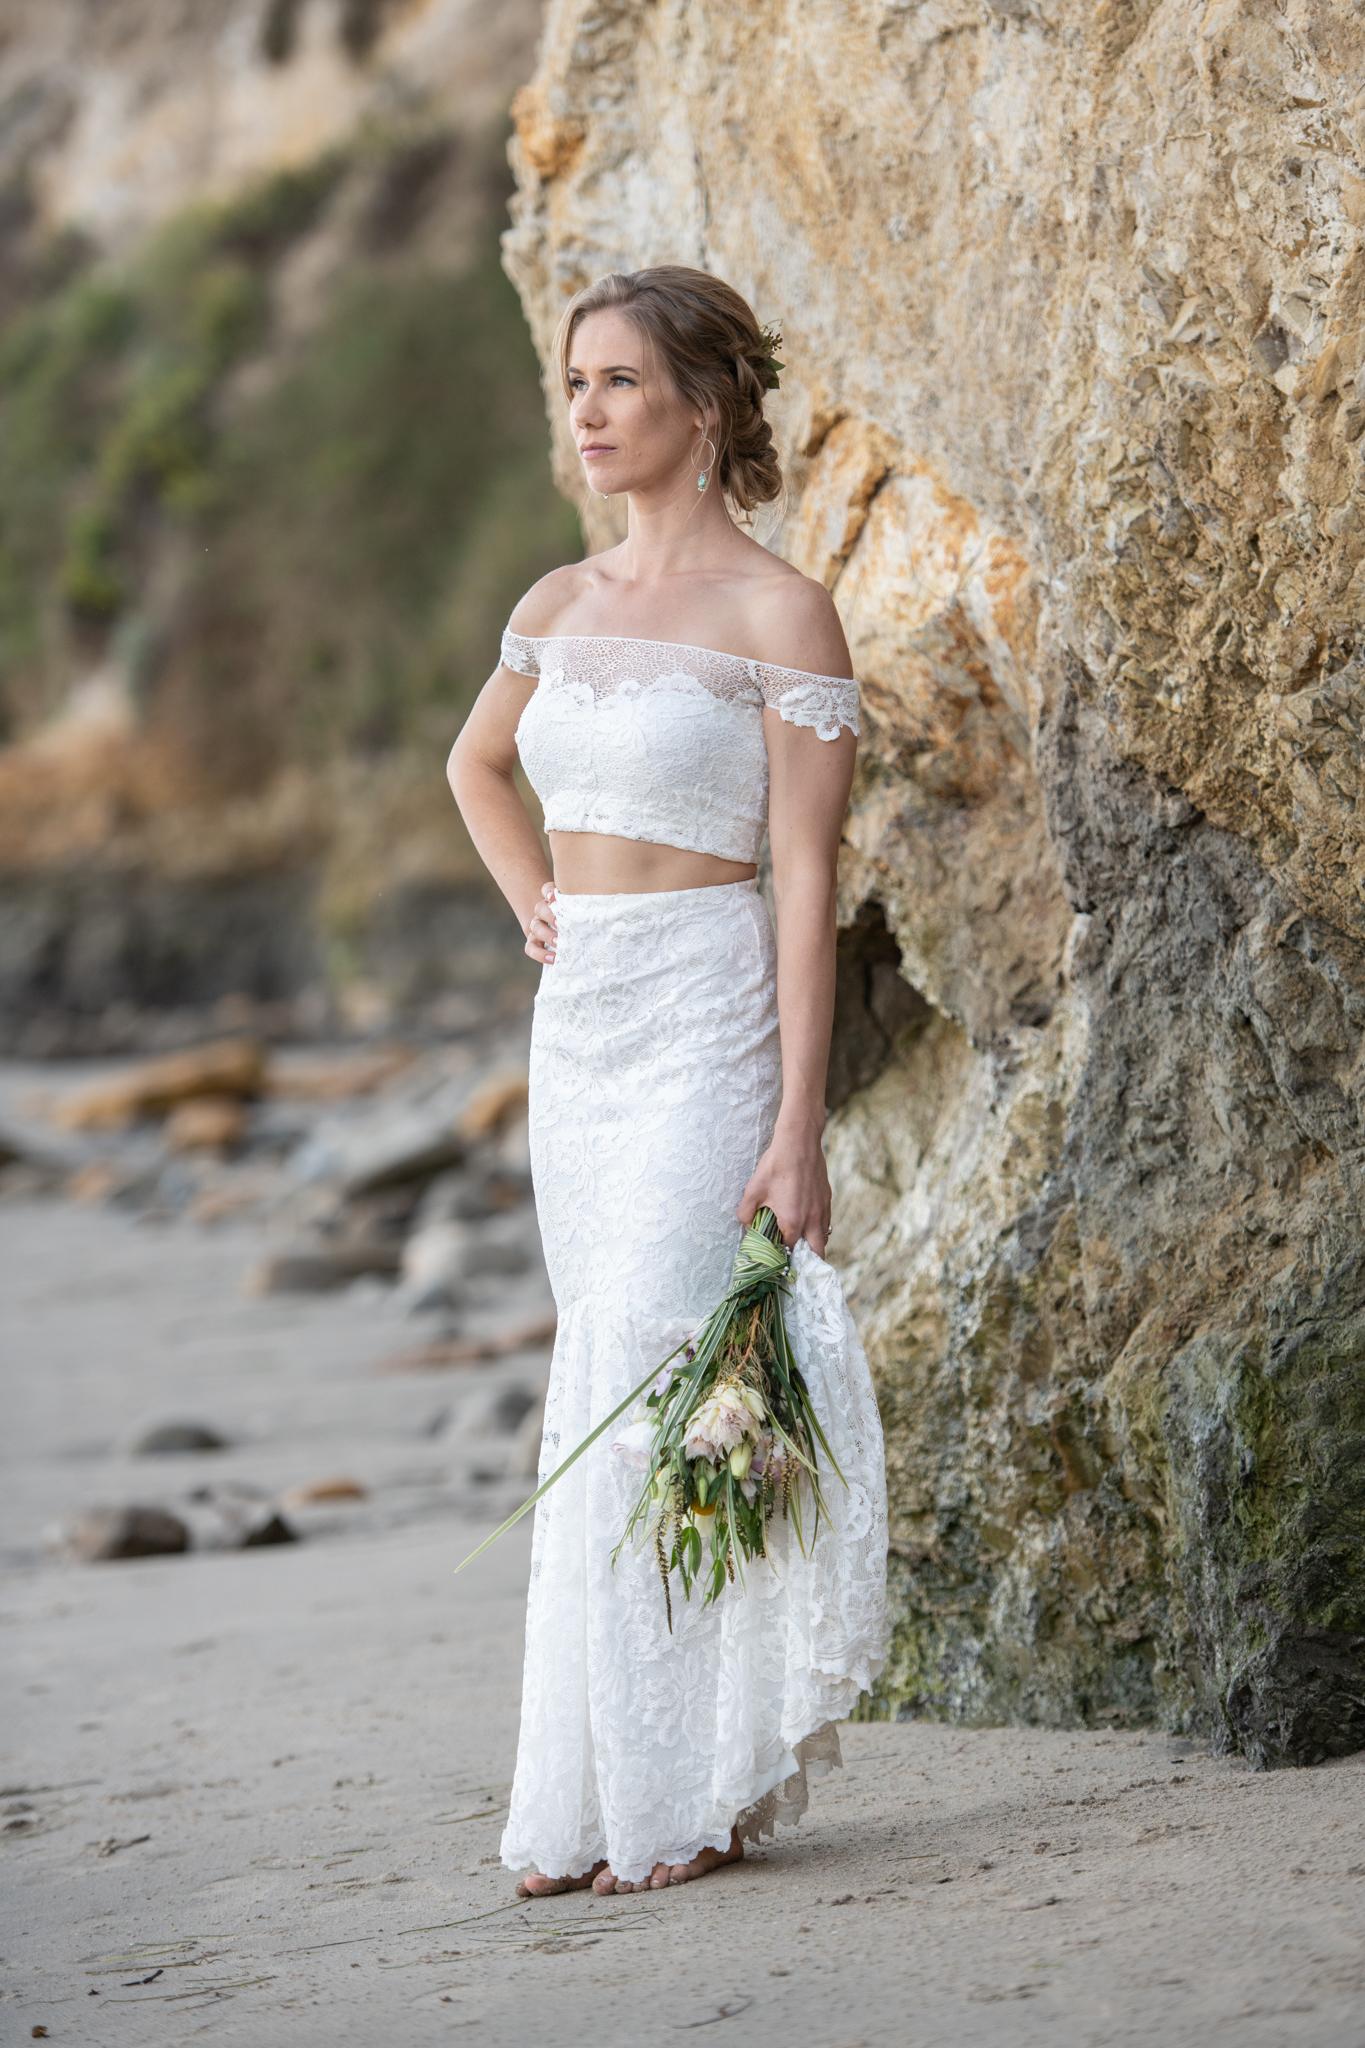 74_PRVW_Jenny_Ken_Wedding_Trevor_Hooper_Photo.jpg